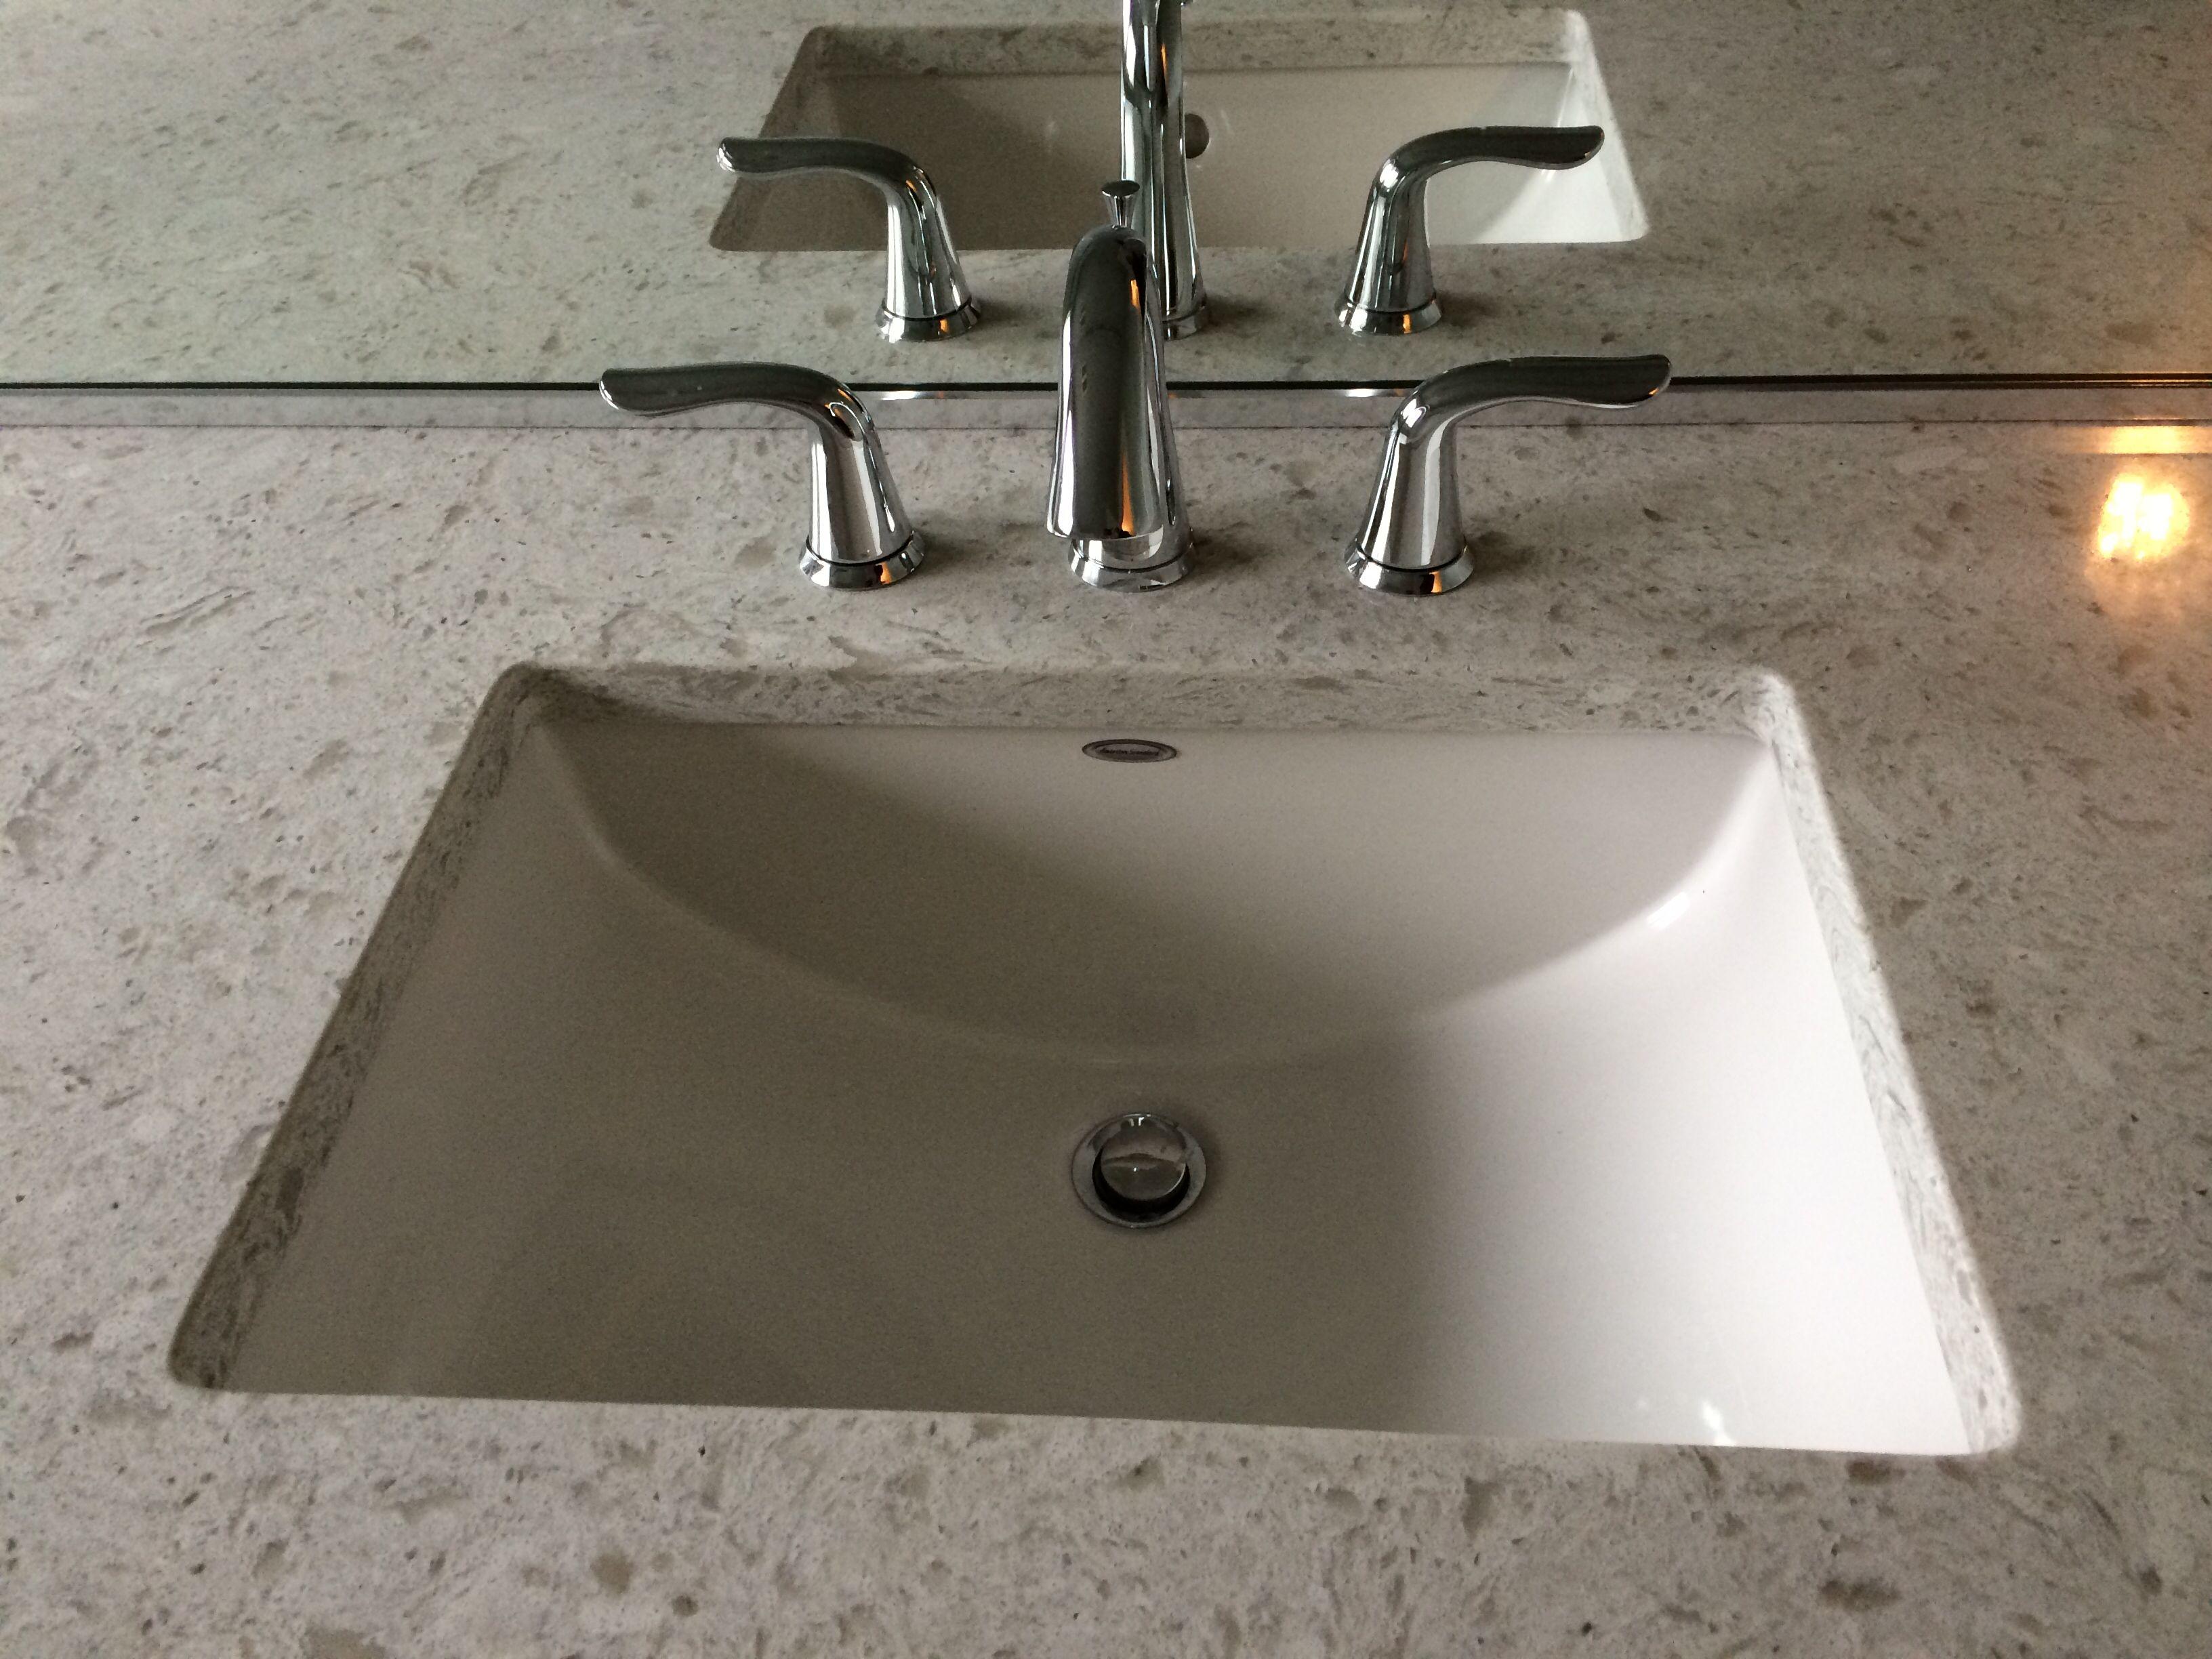 American Standard Studio Under Mount Sink With Delta Lahara Faucet